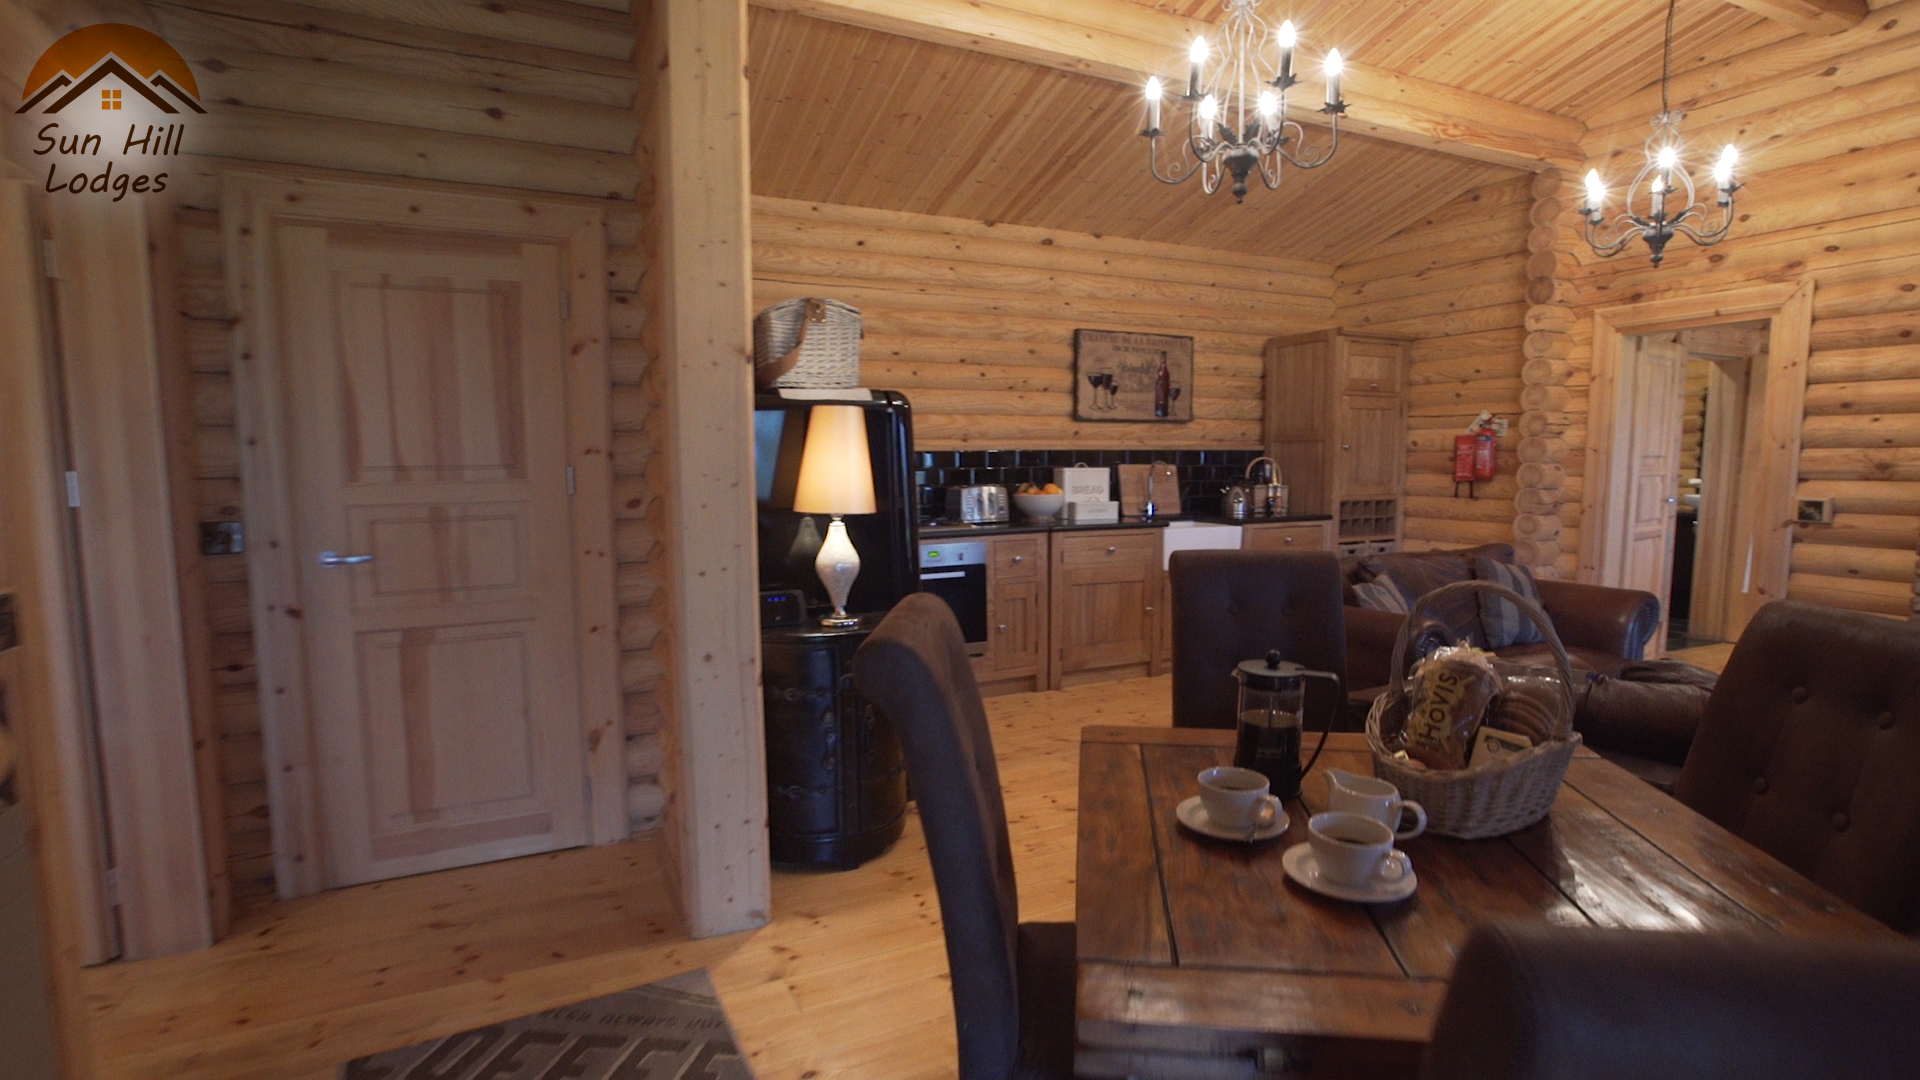 Lodge2_Sunhill.jpg